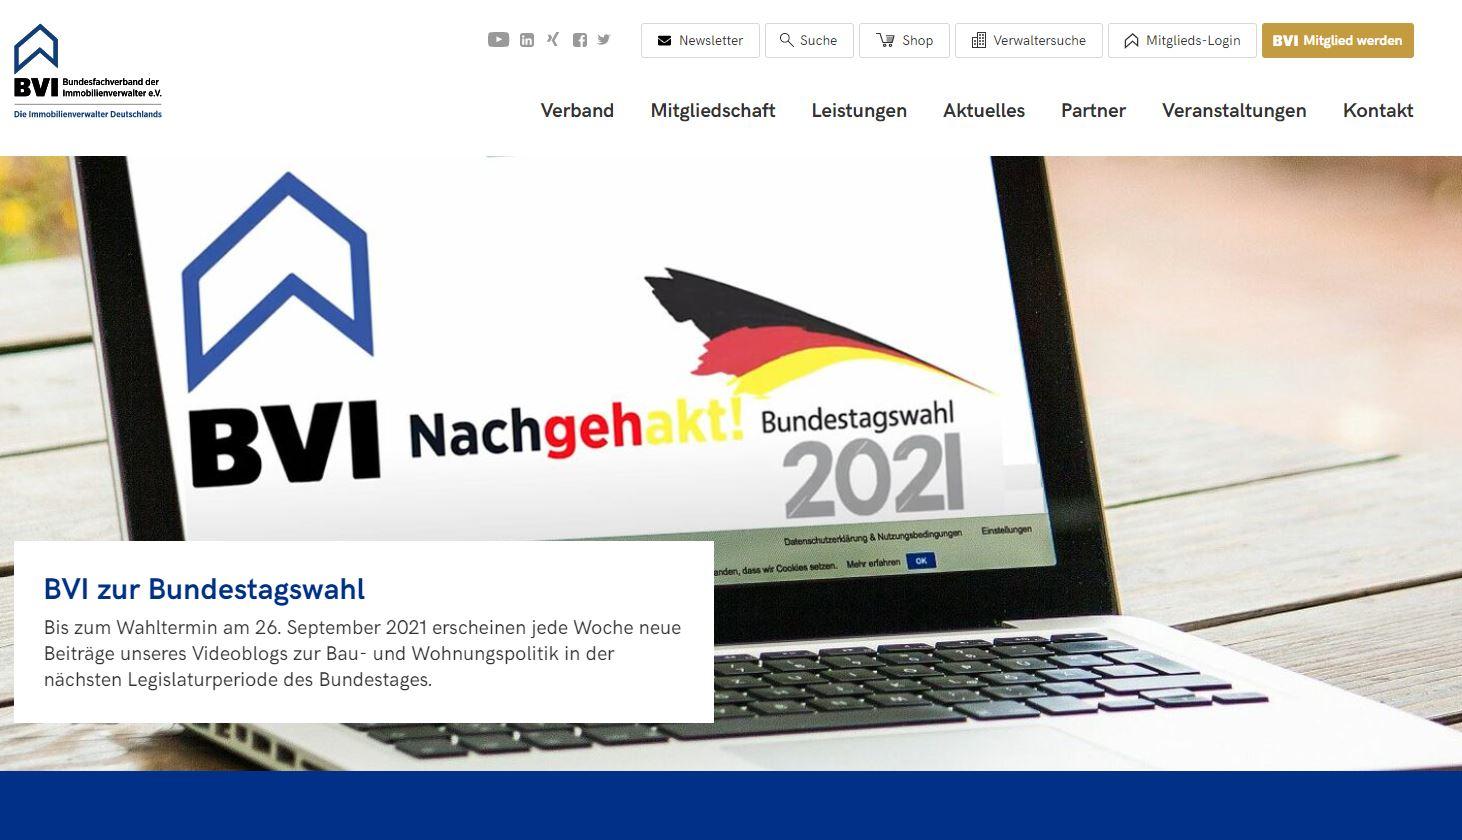 immobilienmakler-verband-bundesverband-immobilienverwalter-BVI